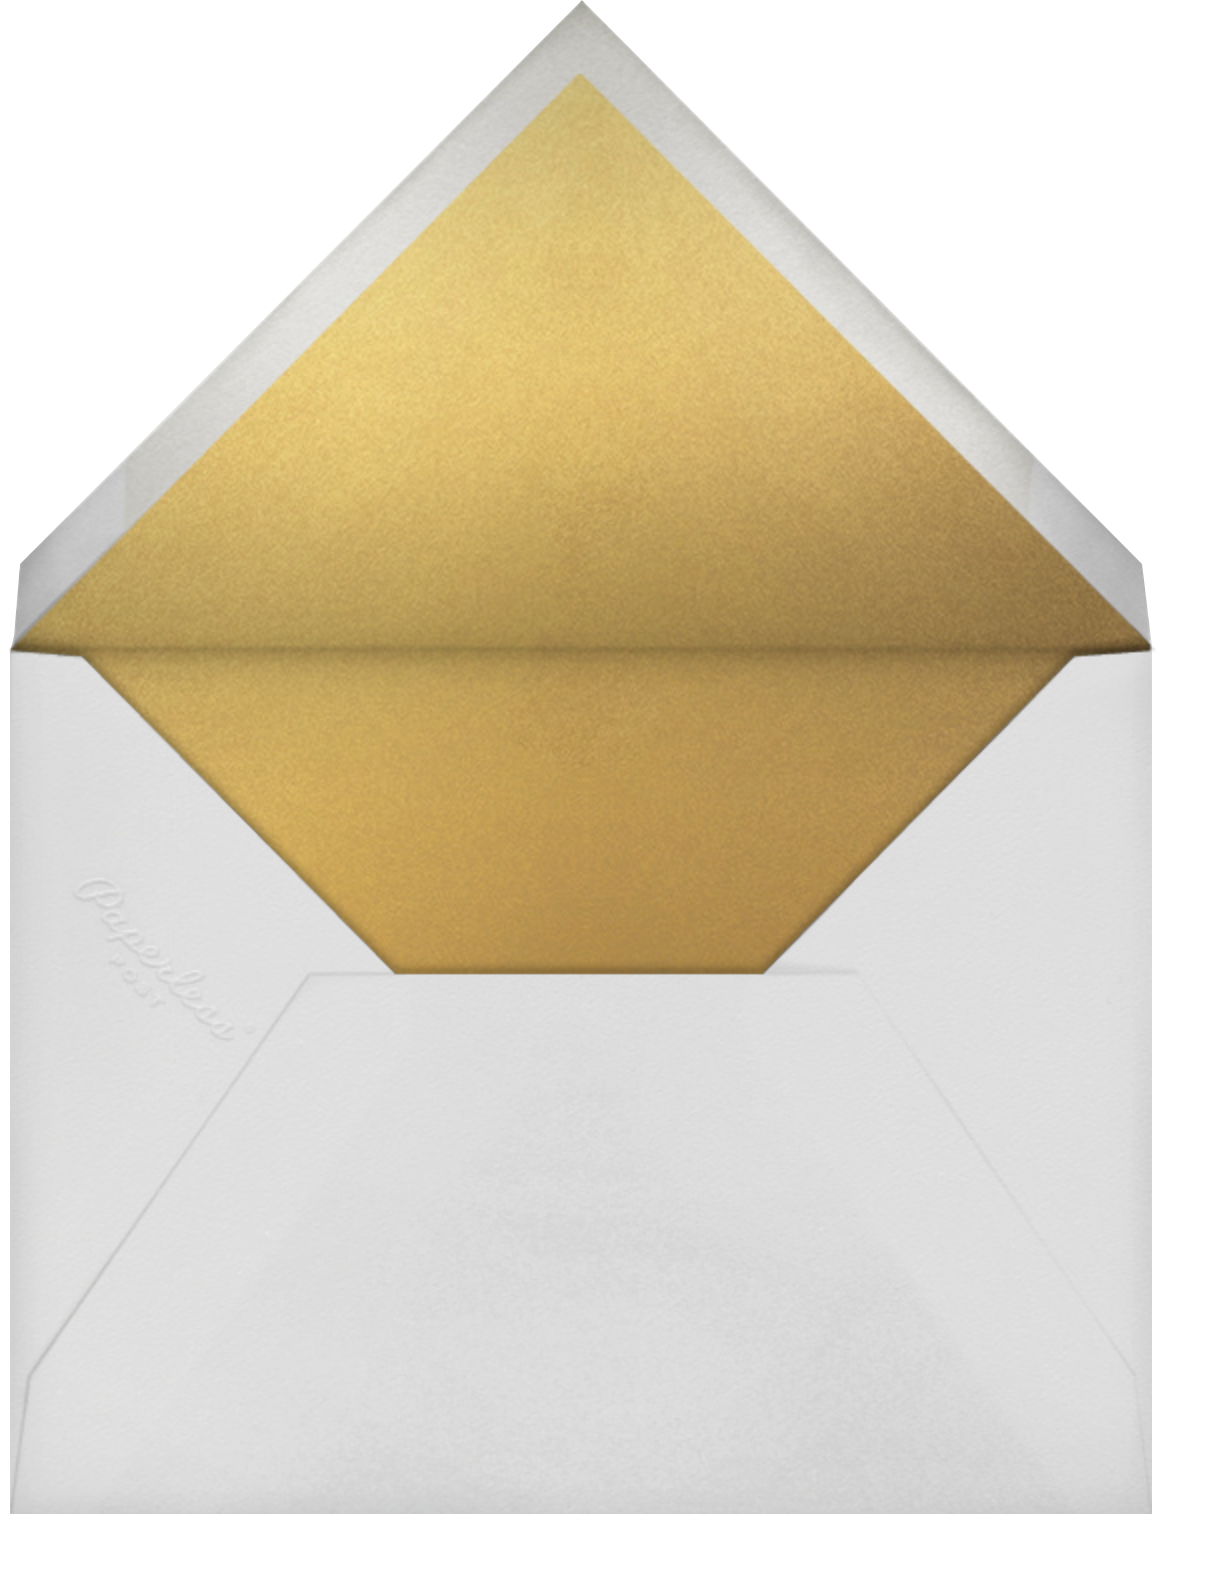 Palmier I (Save the Date) - Gold - Paperless Post - Destination - envelope back